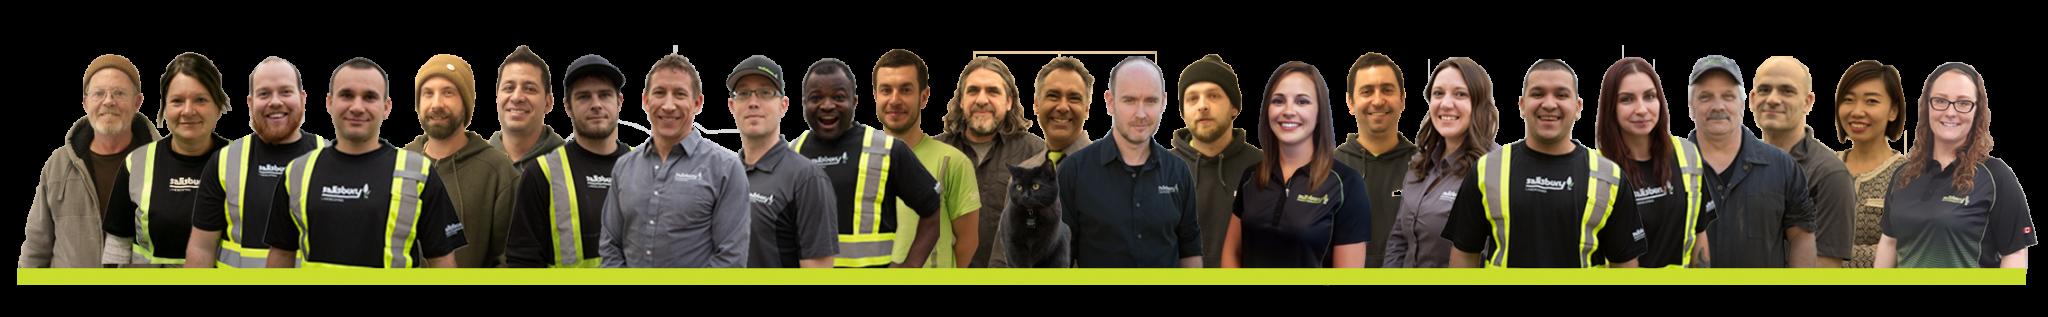 Group photo of Salisbury Landscaping staff